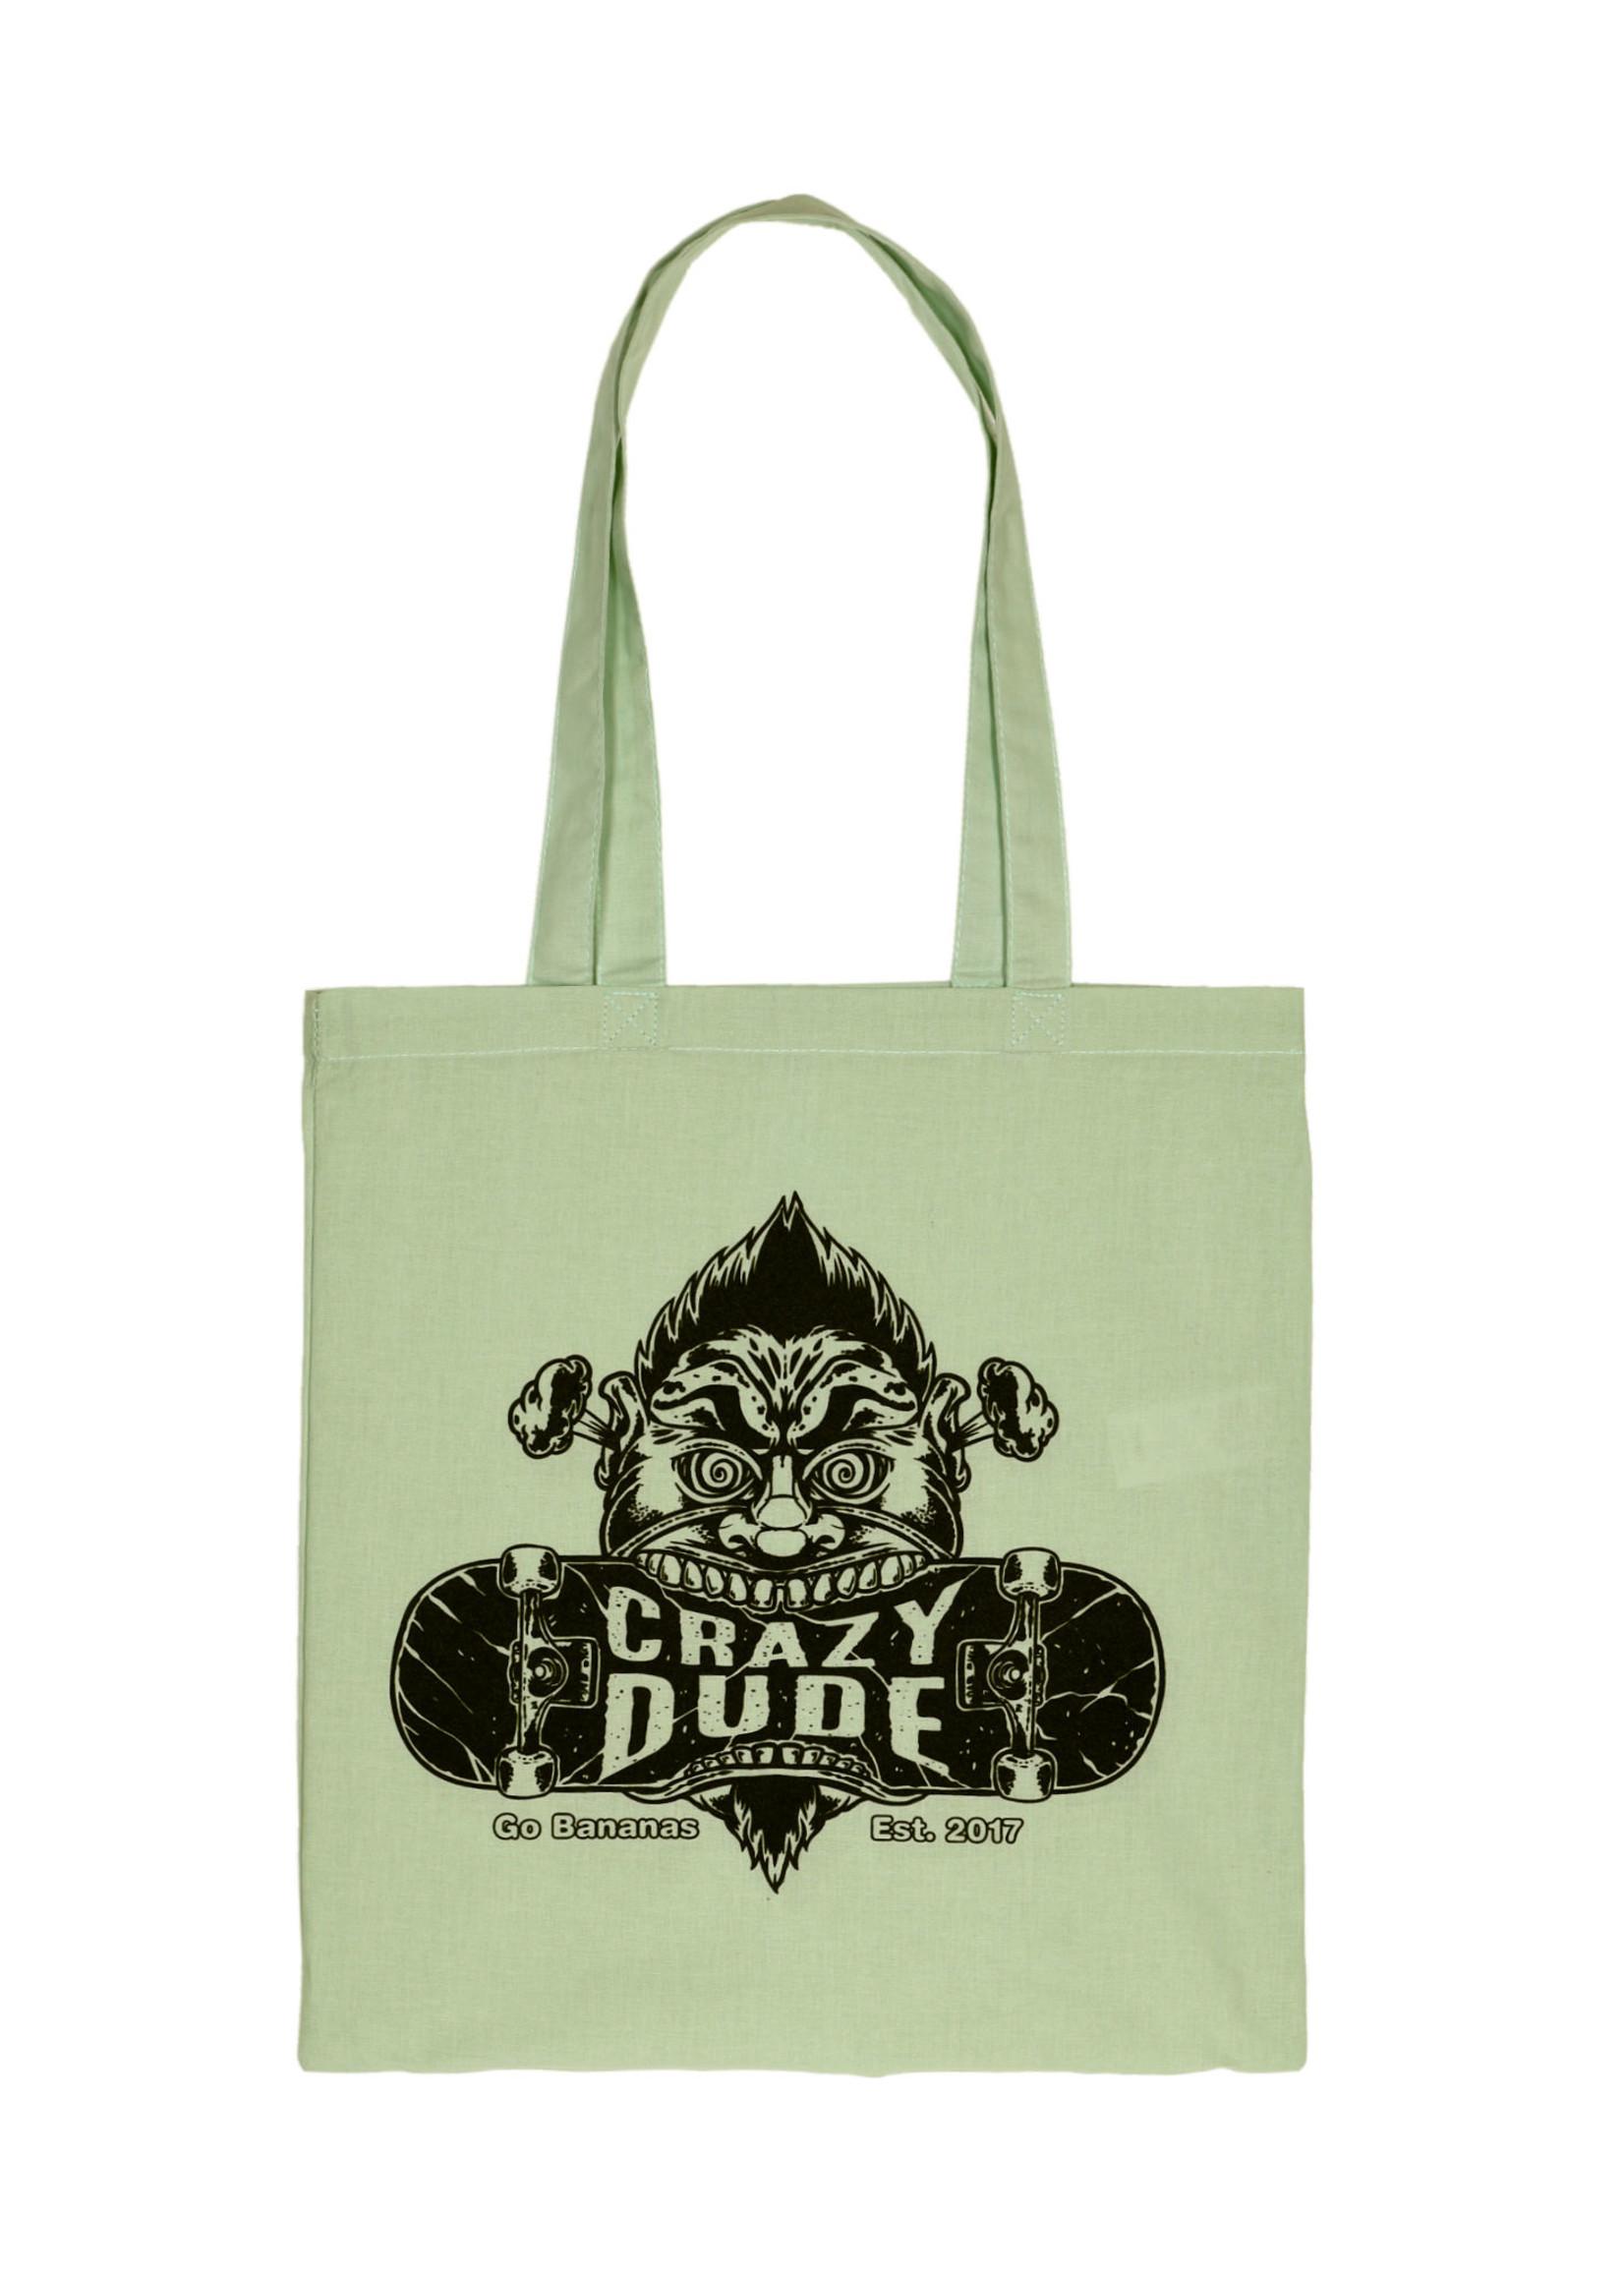 Crazy Dude Crazy Dude Tote Bag Destroyer Pastel Mint